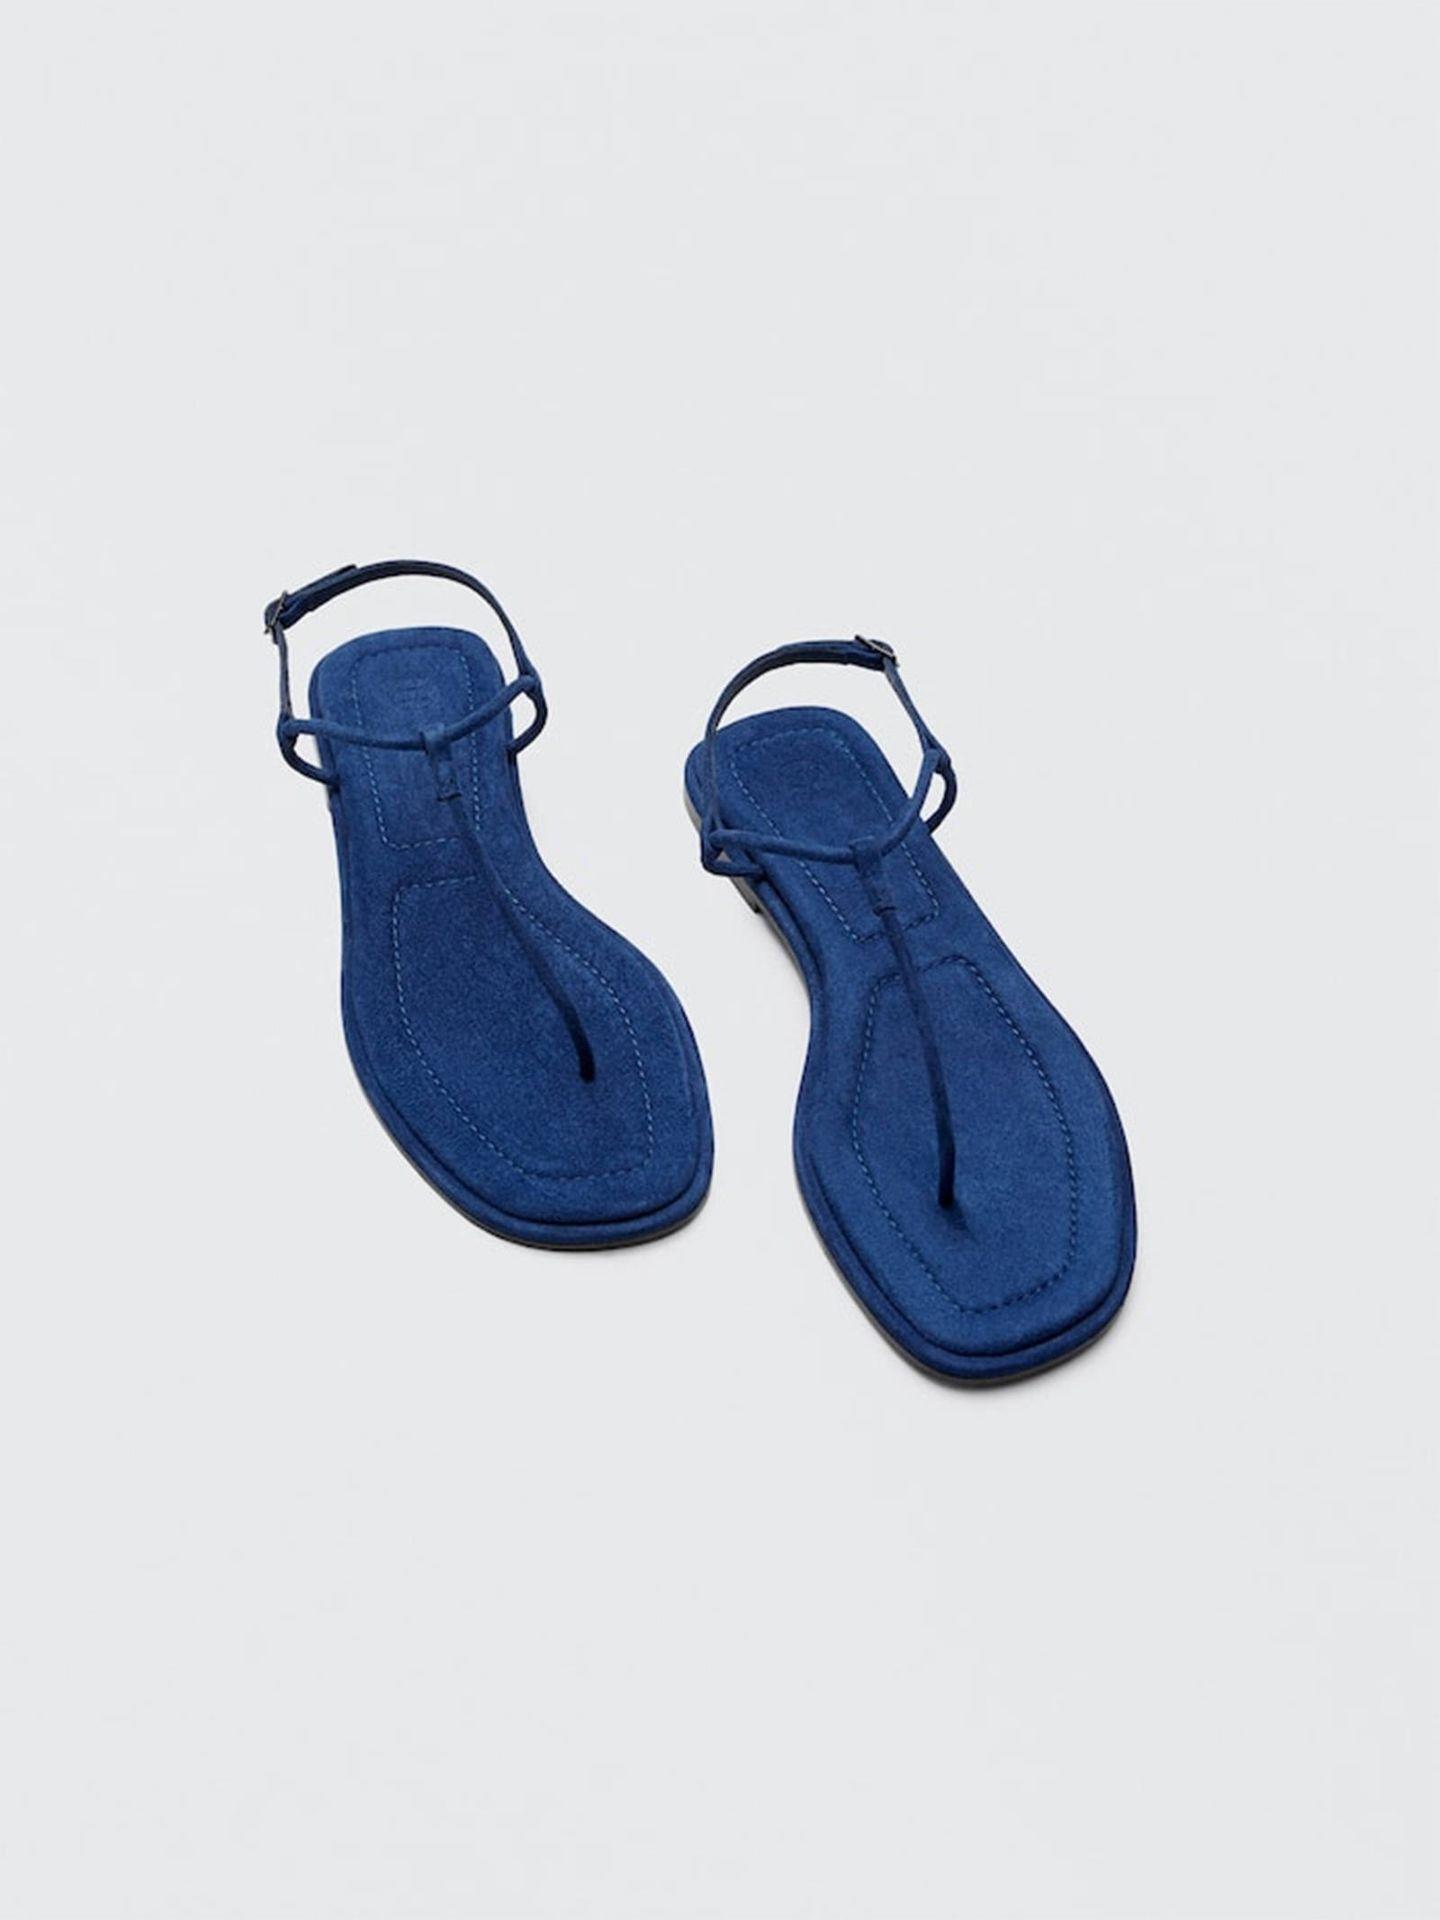 Sandalias planas de Massimo Dutti. (Cortesía)